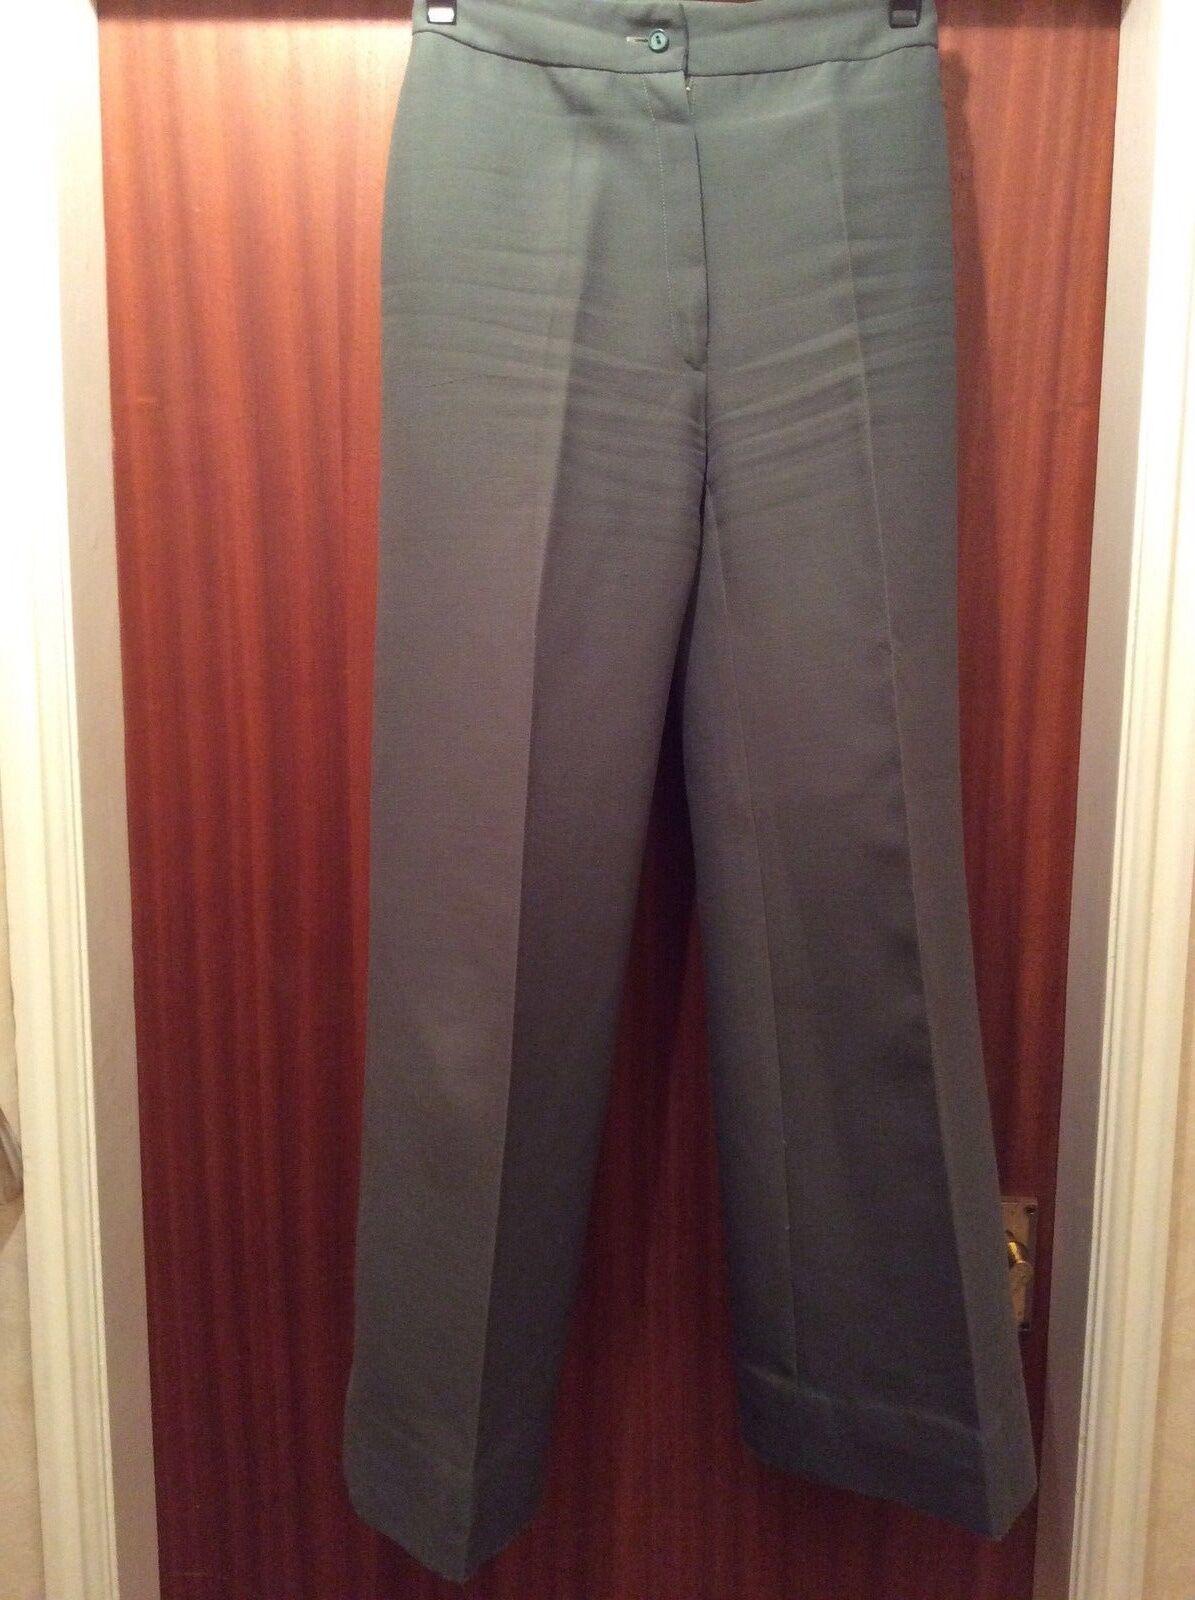 1970's Jaques Grün Wide Leg Trousers 25% Wool Tergal Vintage Größe12 French Grün